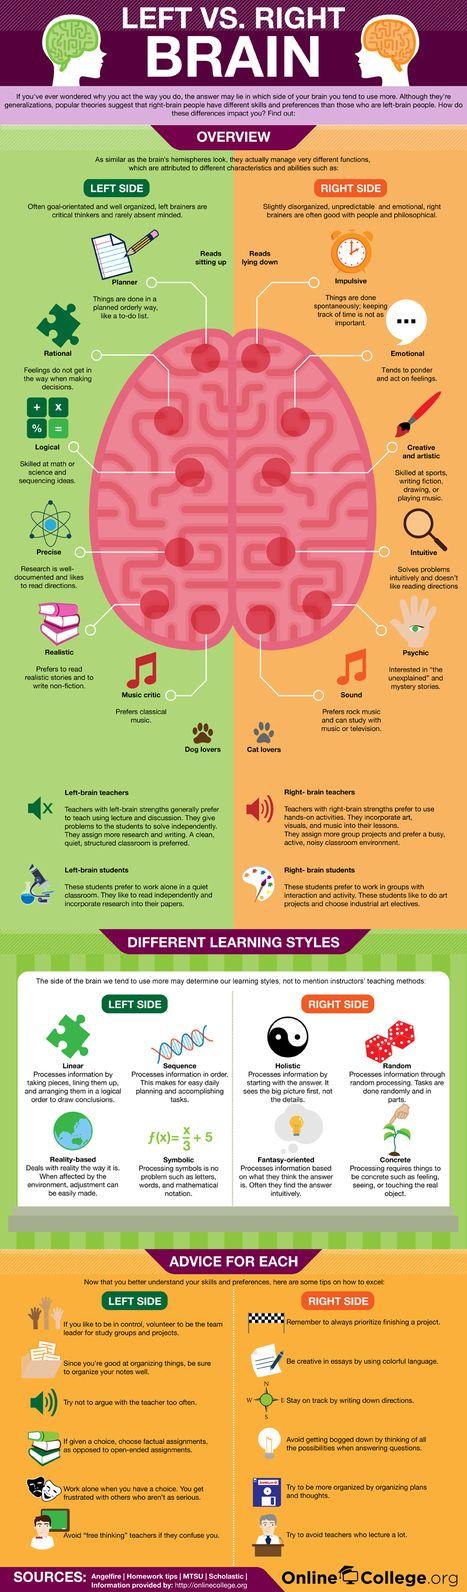 Infographic: Left brain versus right brain communication | CrowdSourcing InfoGraphics | Scoop.it